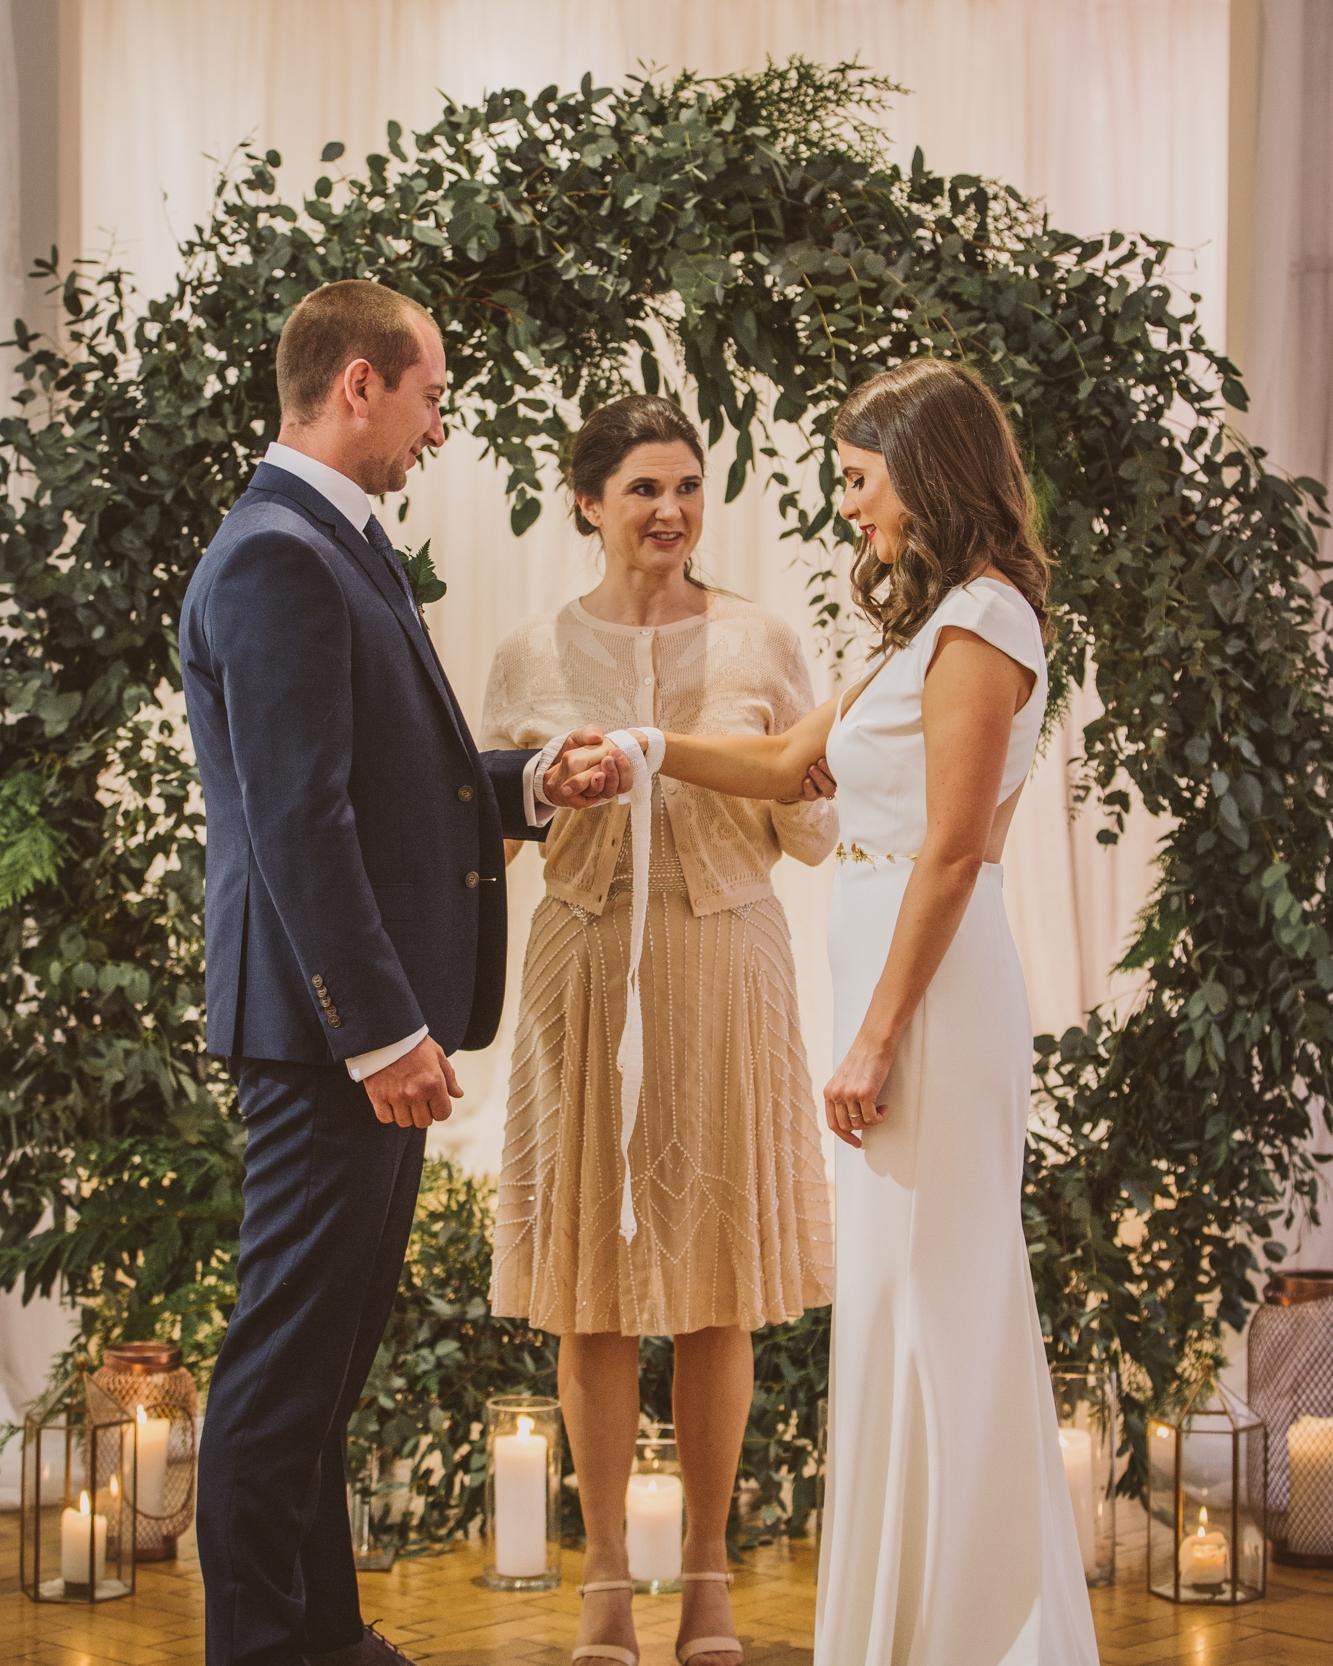 City_Centre_northern_ireland_wedding_inspire_weddings_17.jpg